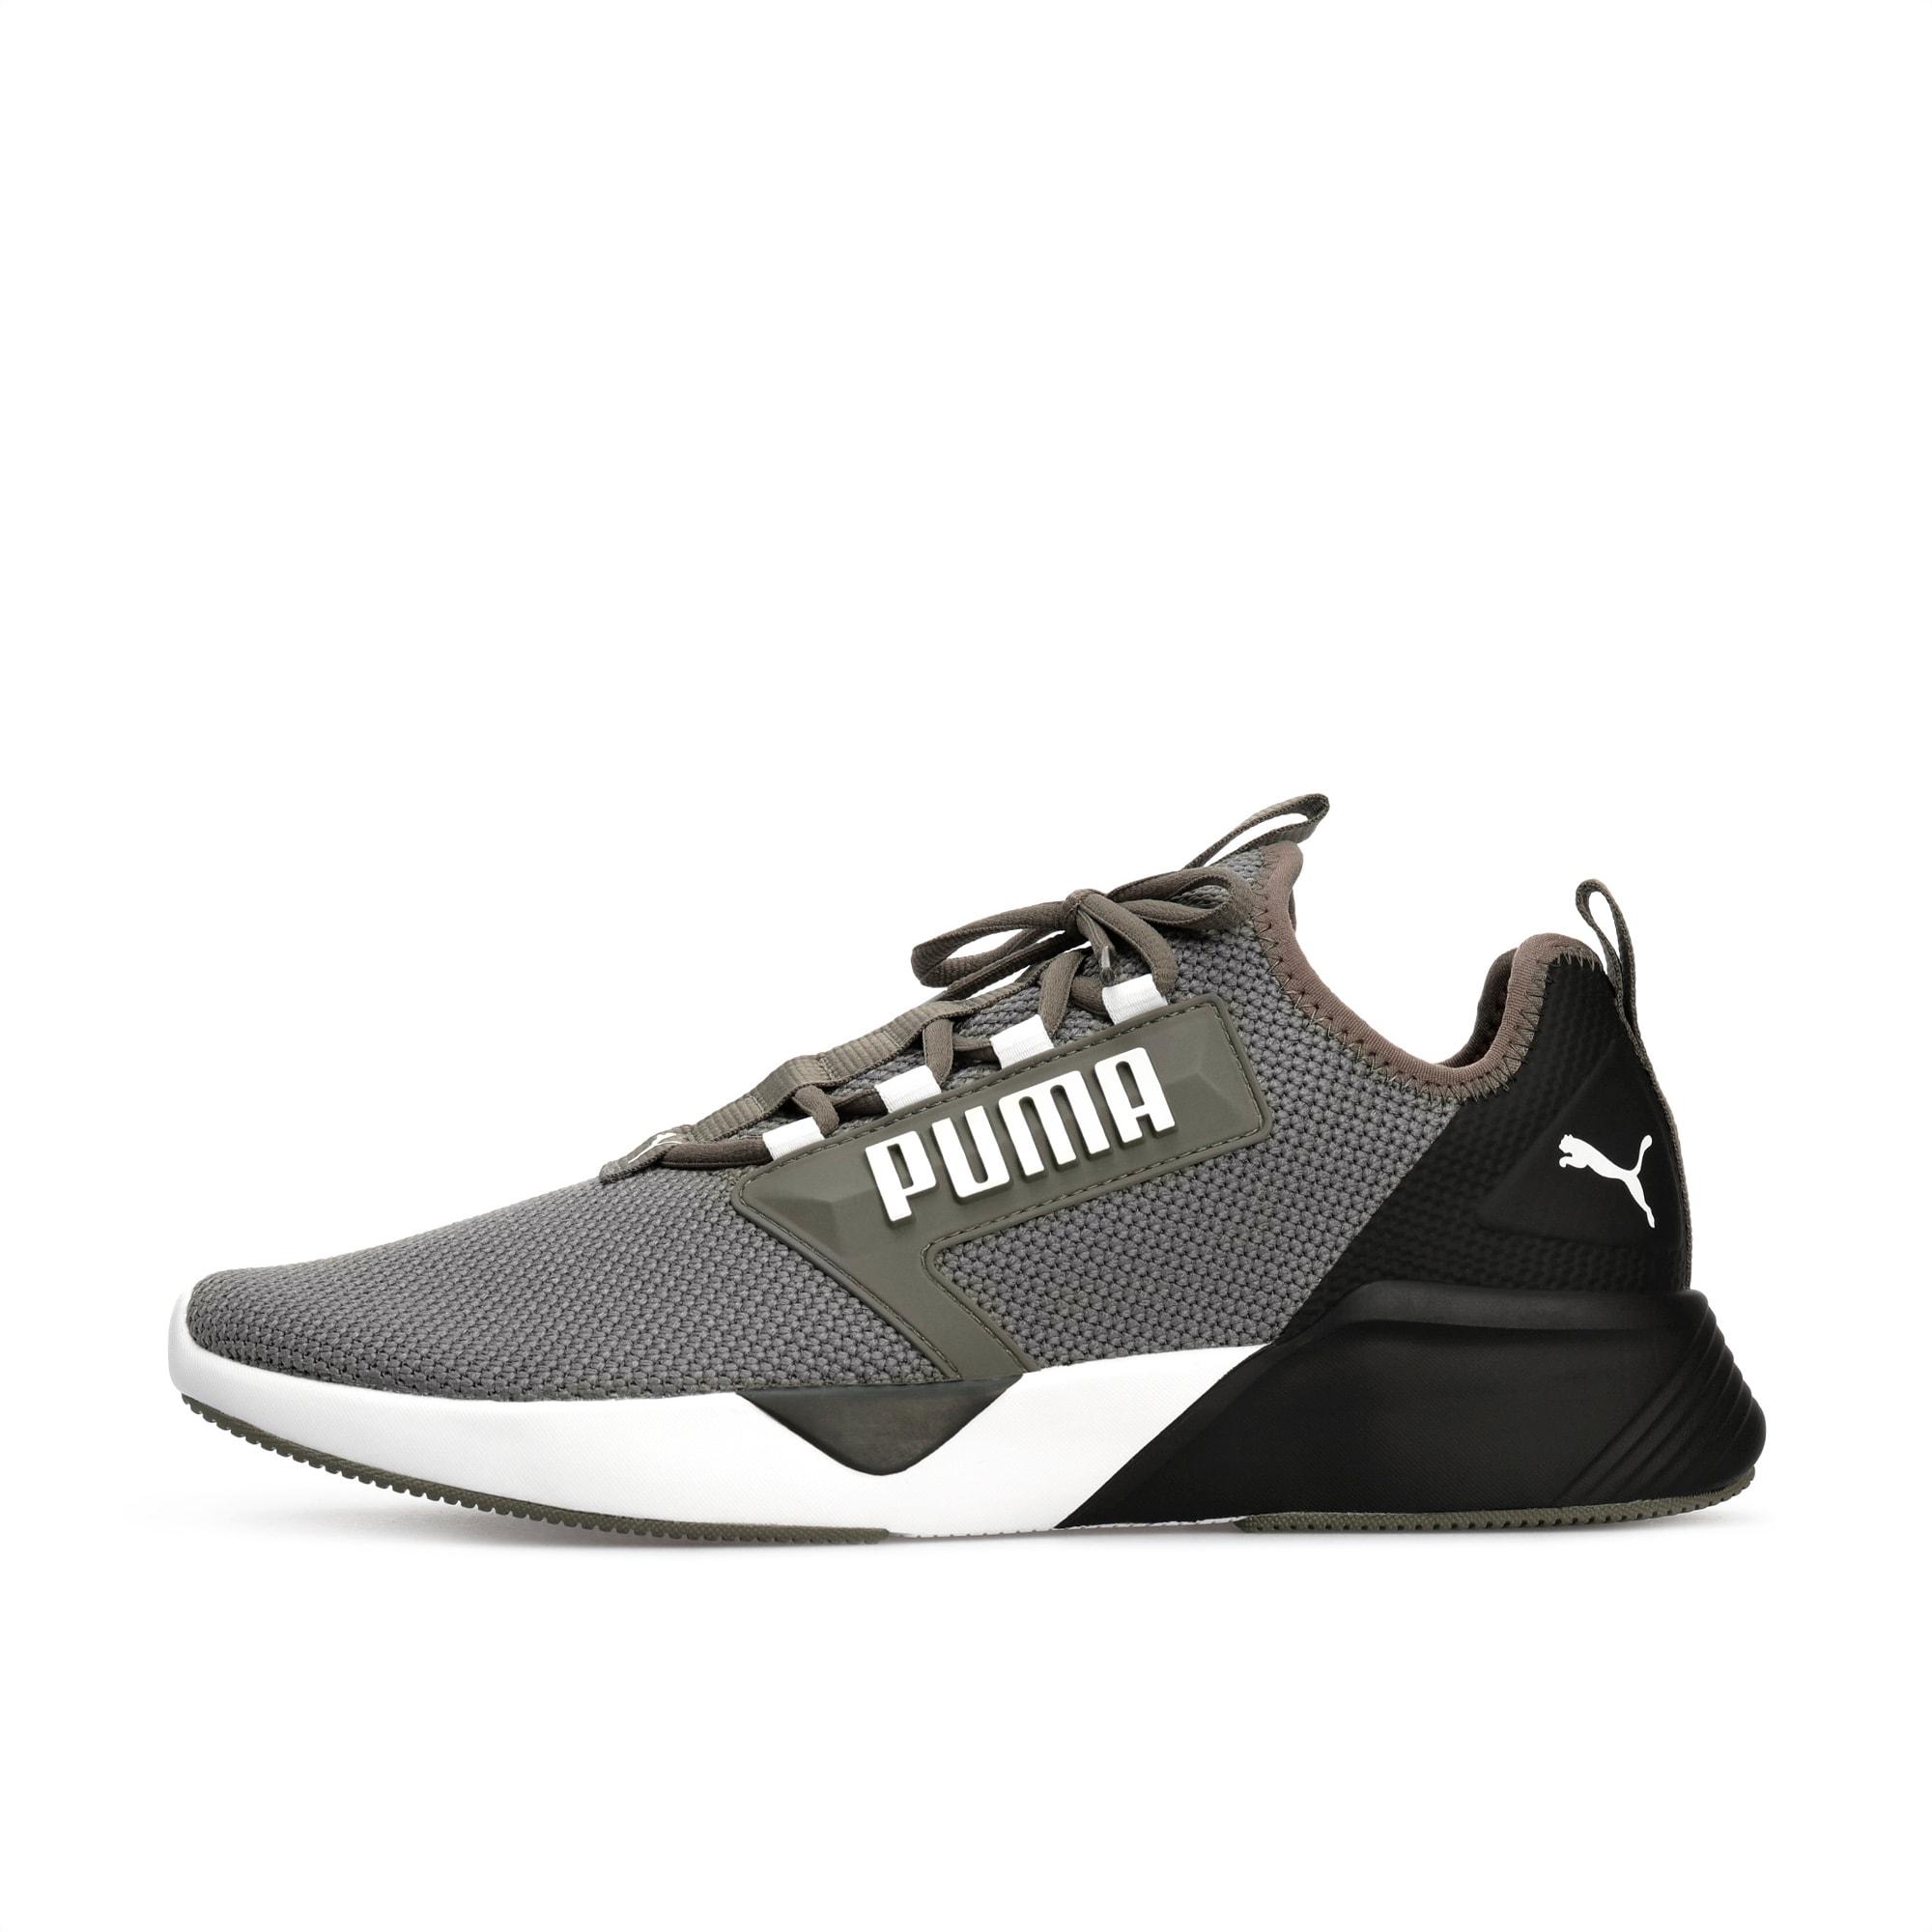 Retaliate Men's Running Shoes | PUMA Mens Styles | PUMA Estonia